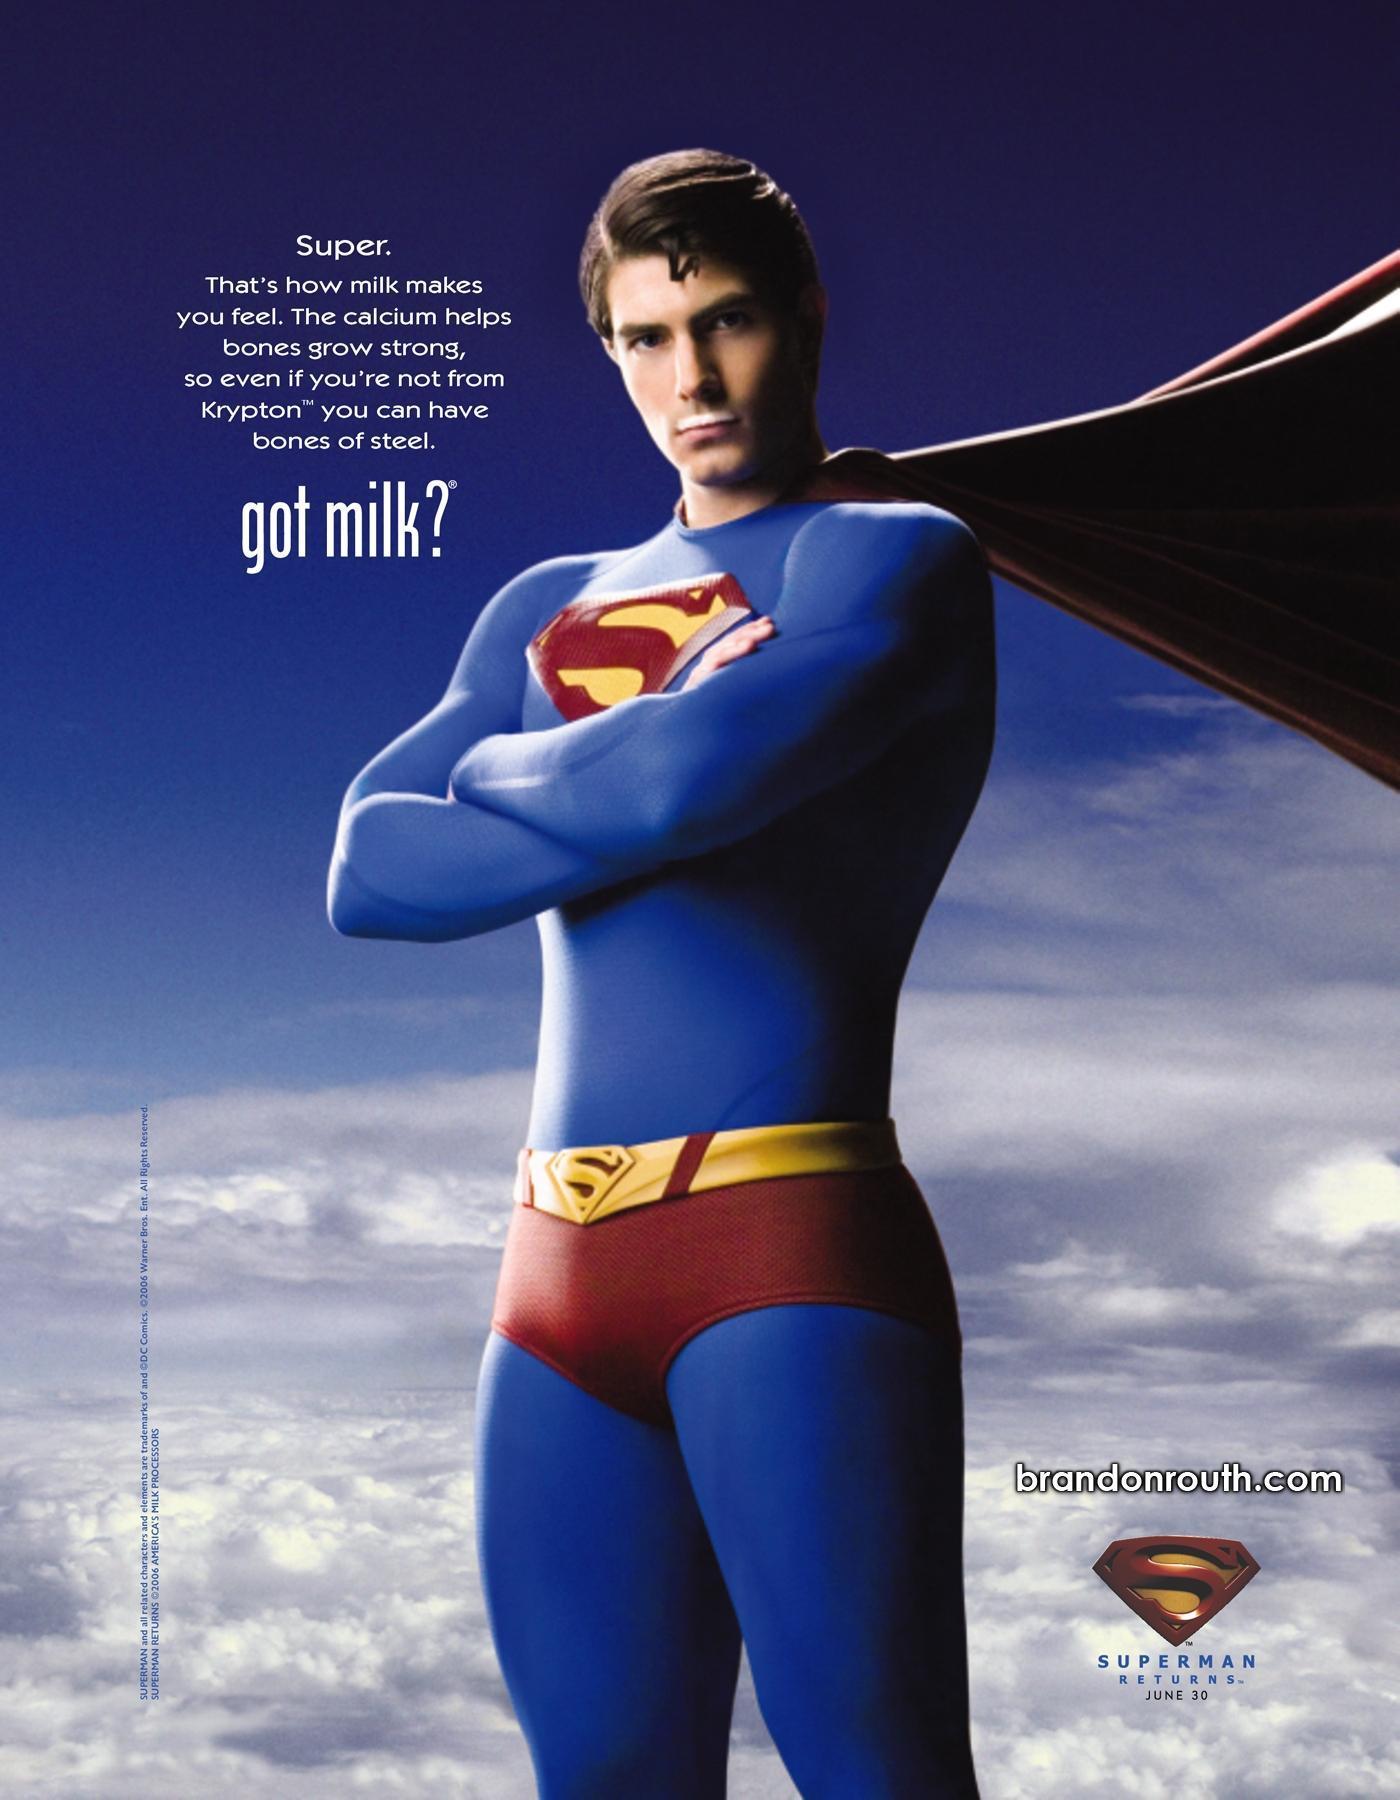 superman-got-milk